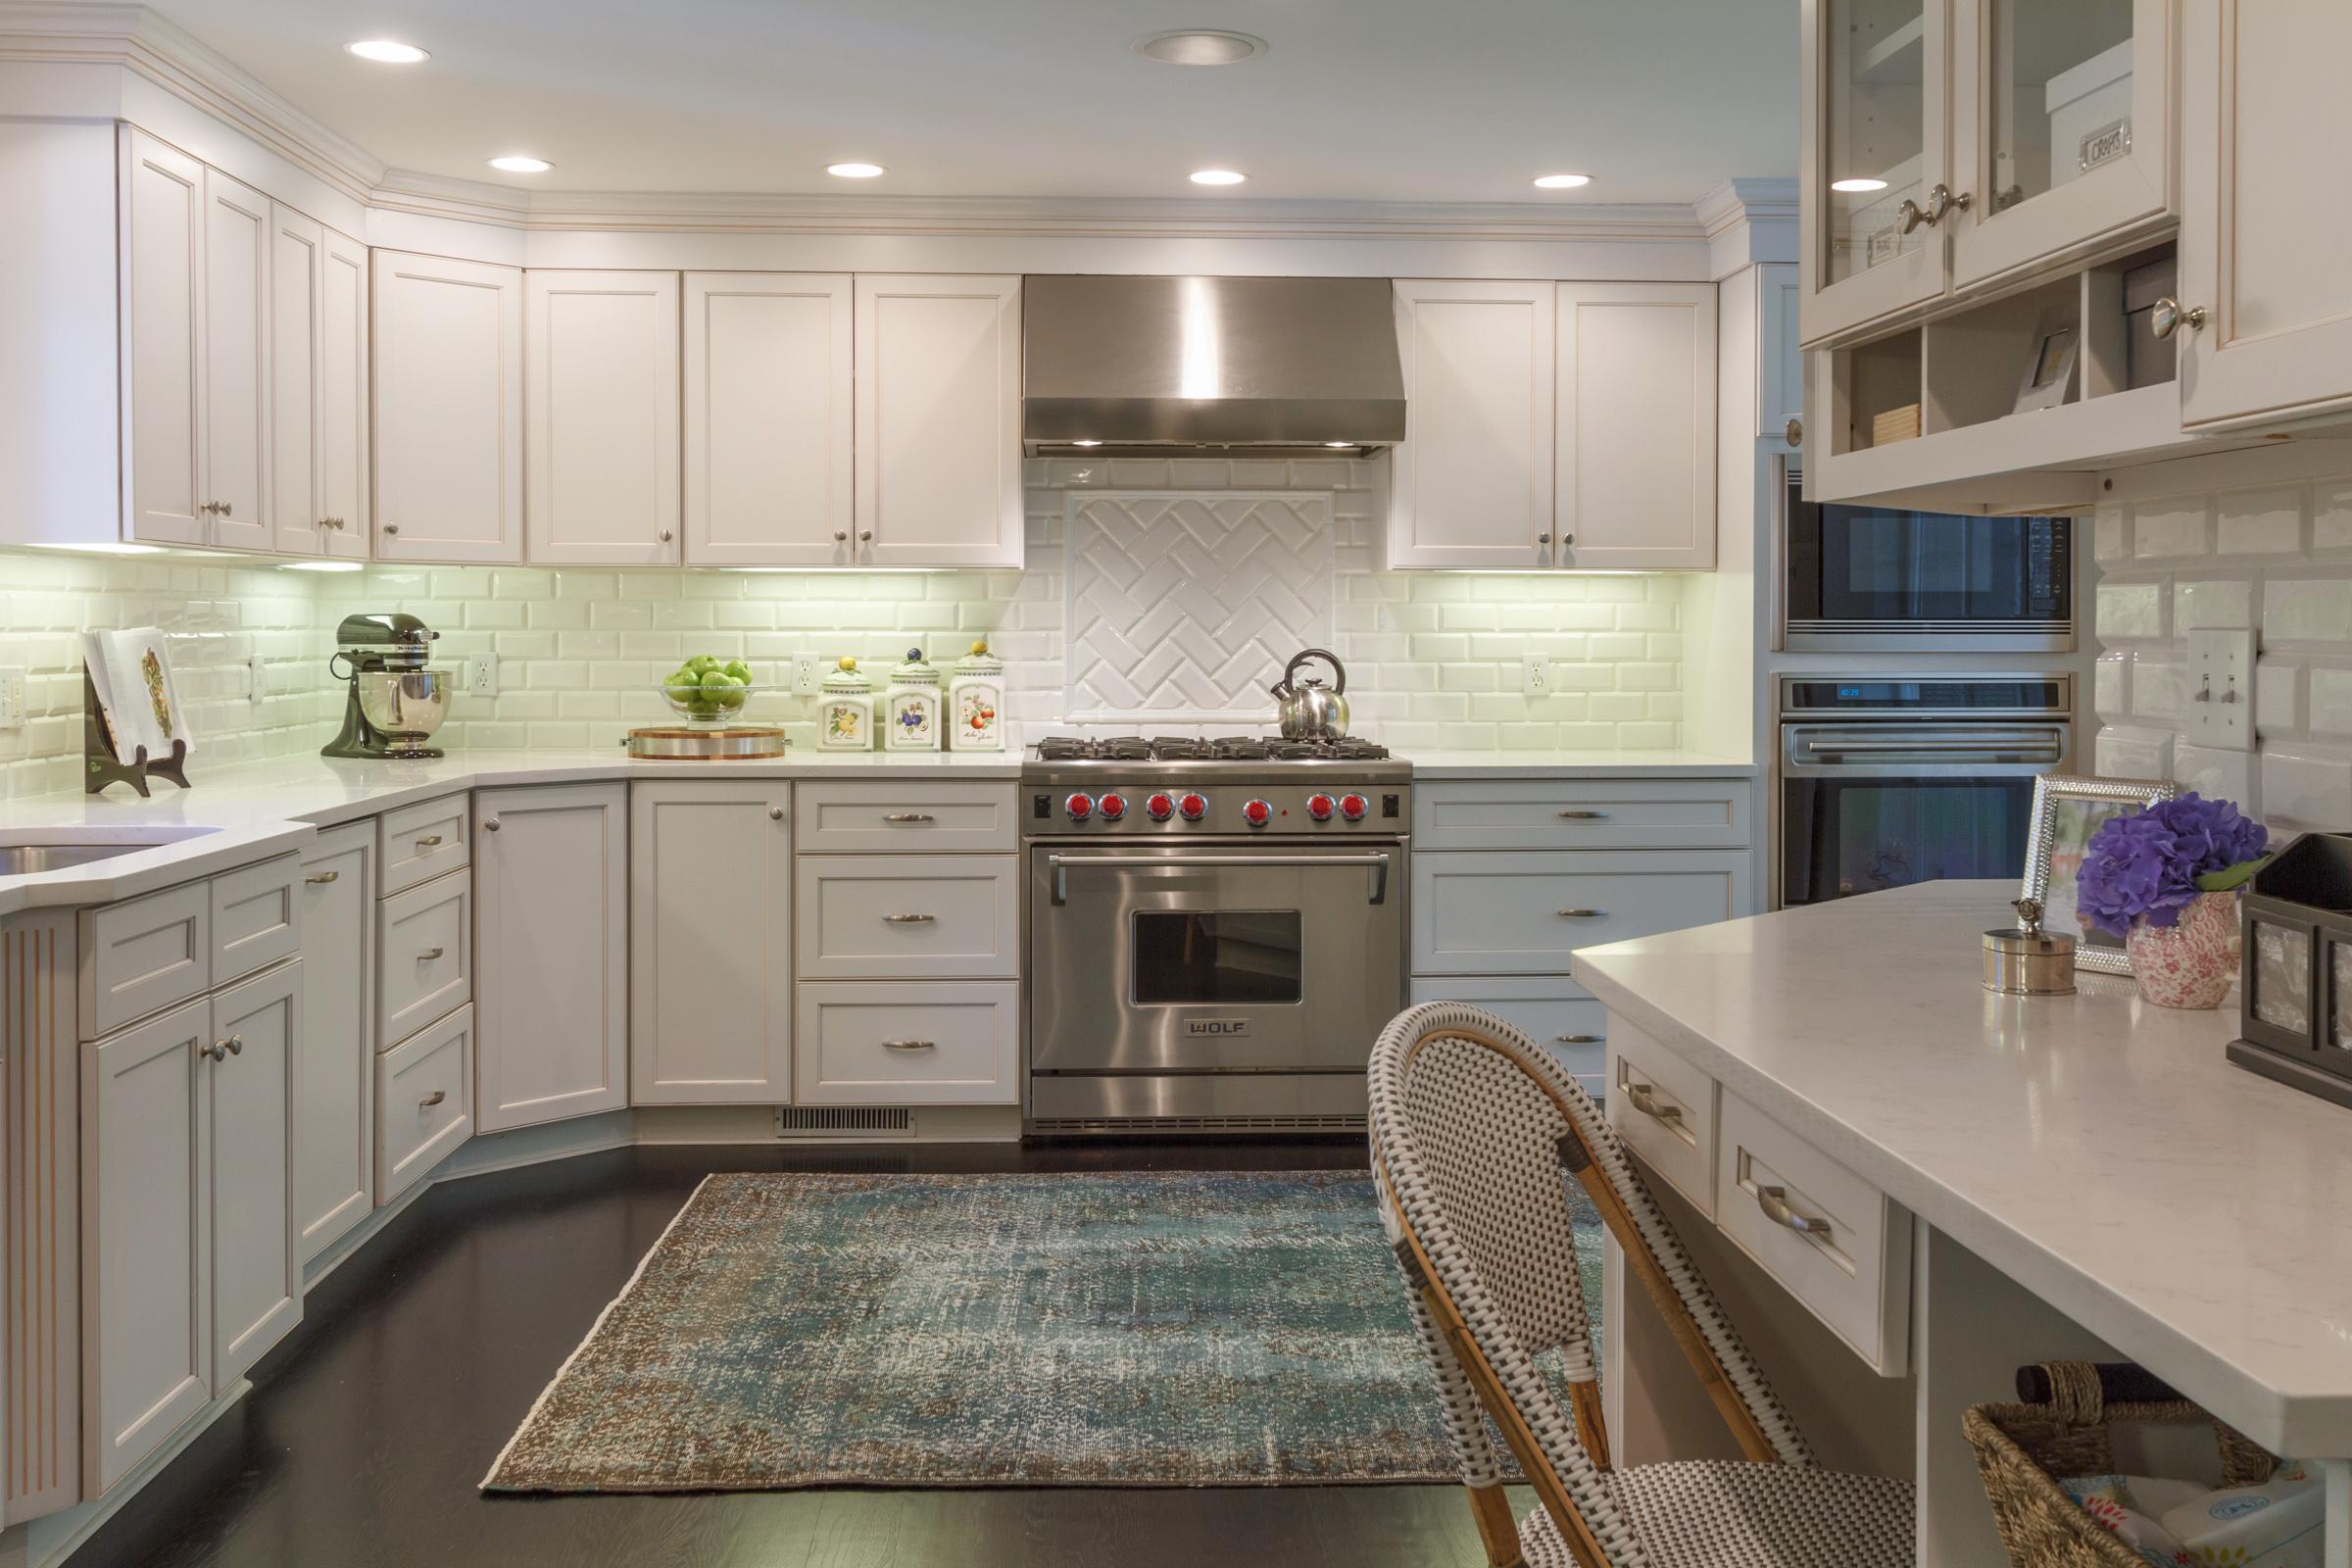 Kitchen - with oven dials - original.jpg